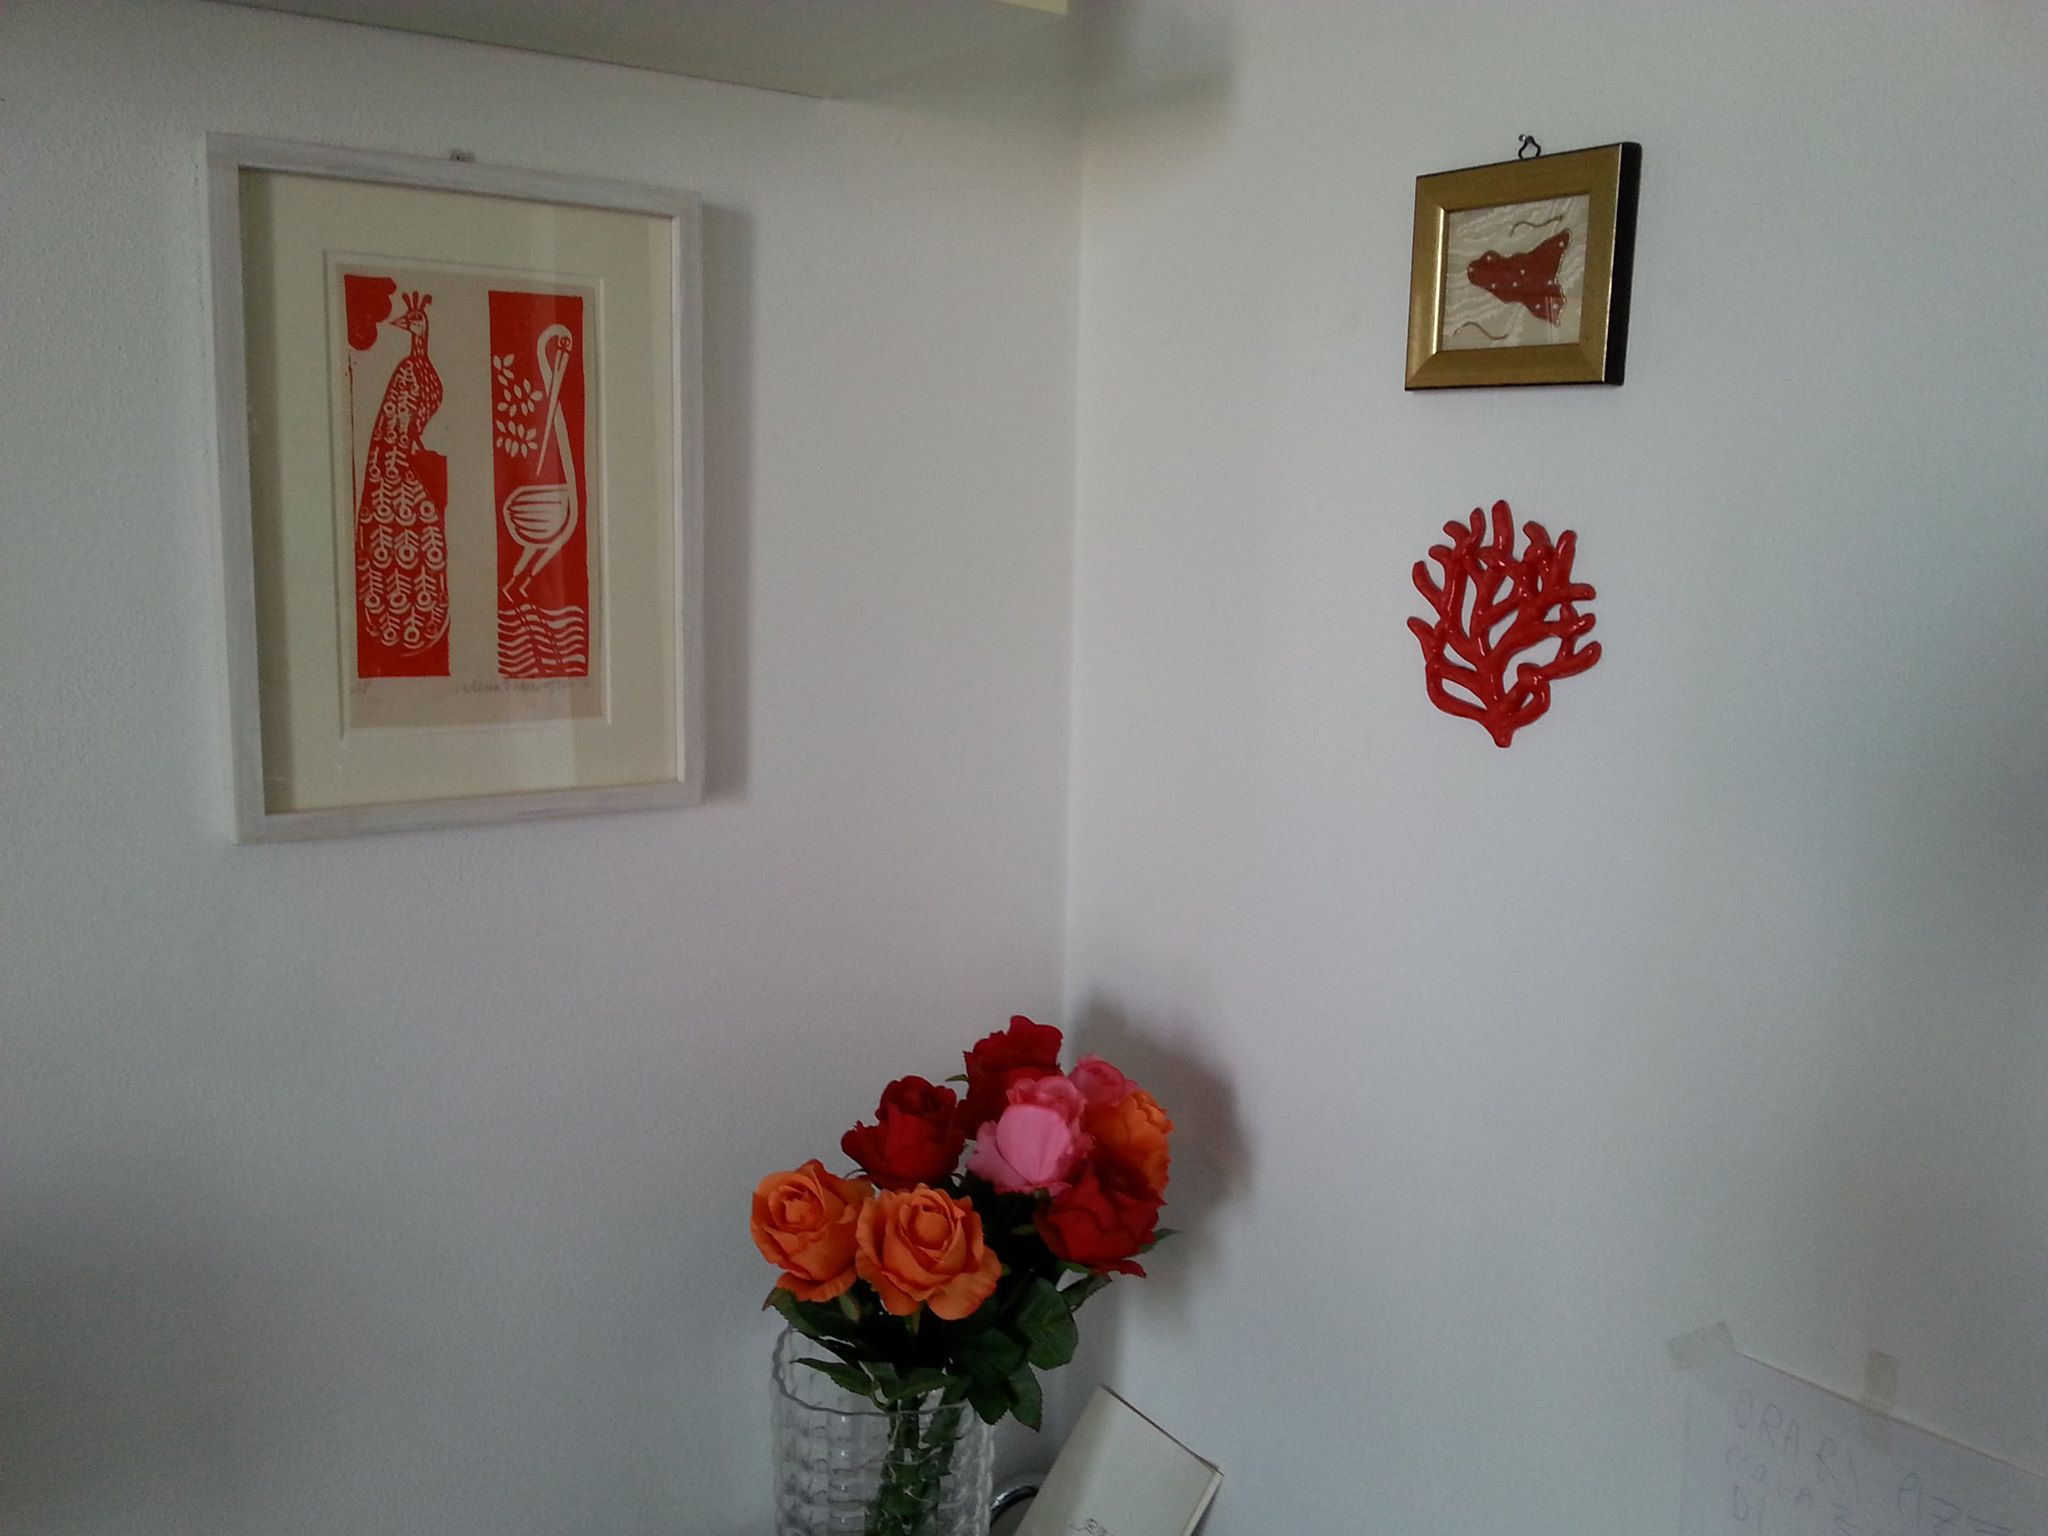 linocut prints, 2014